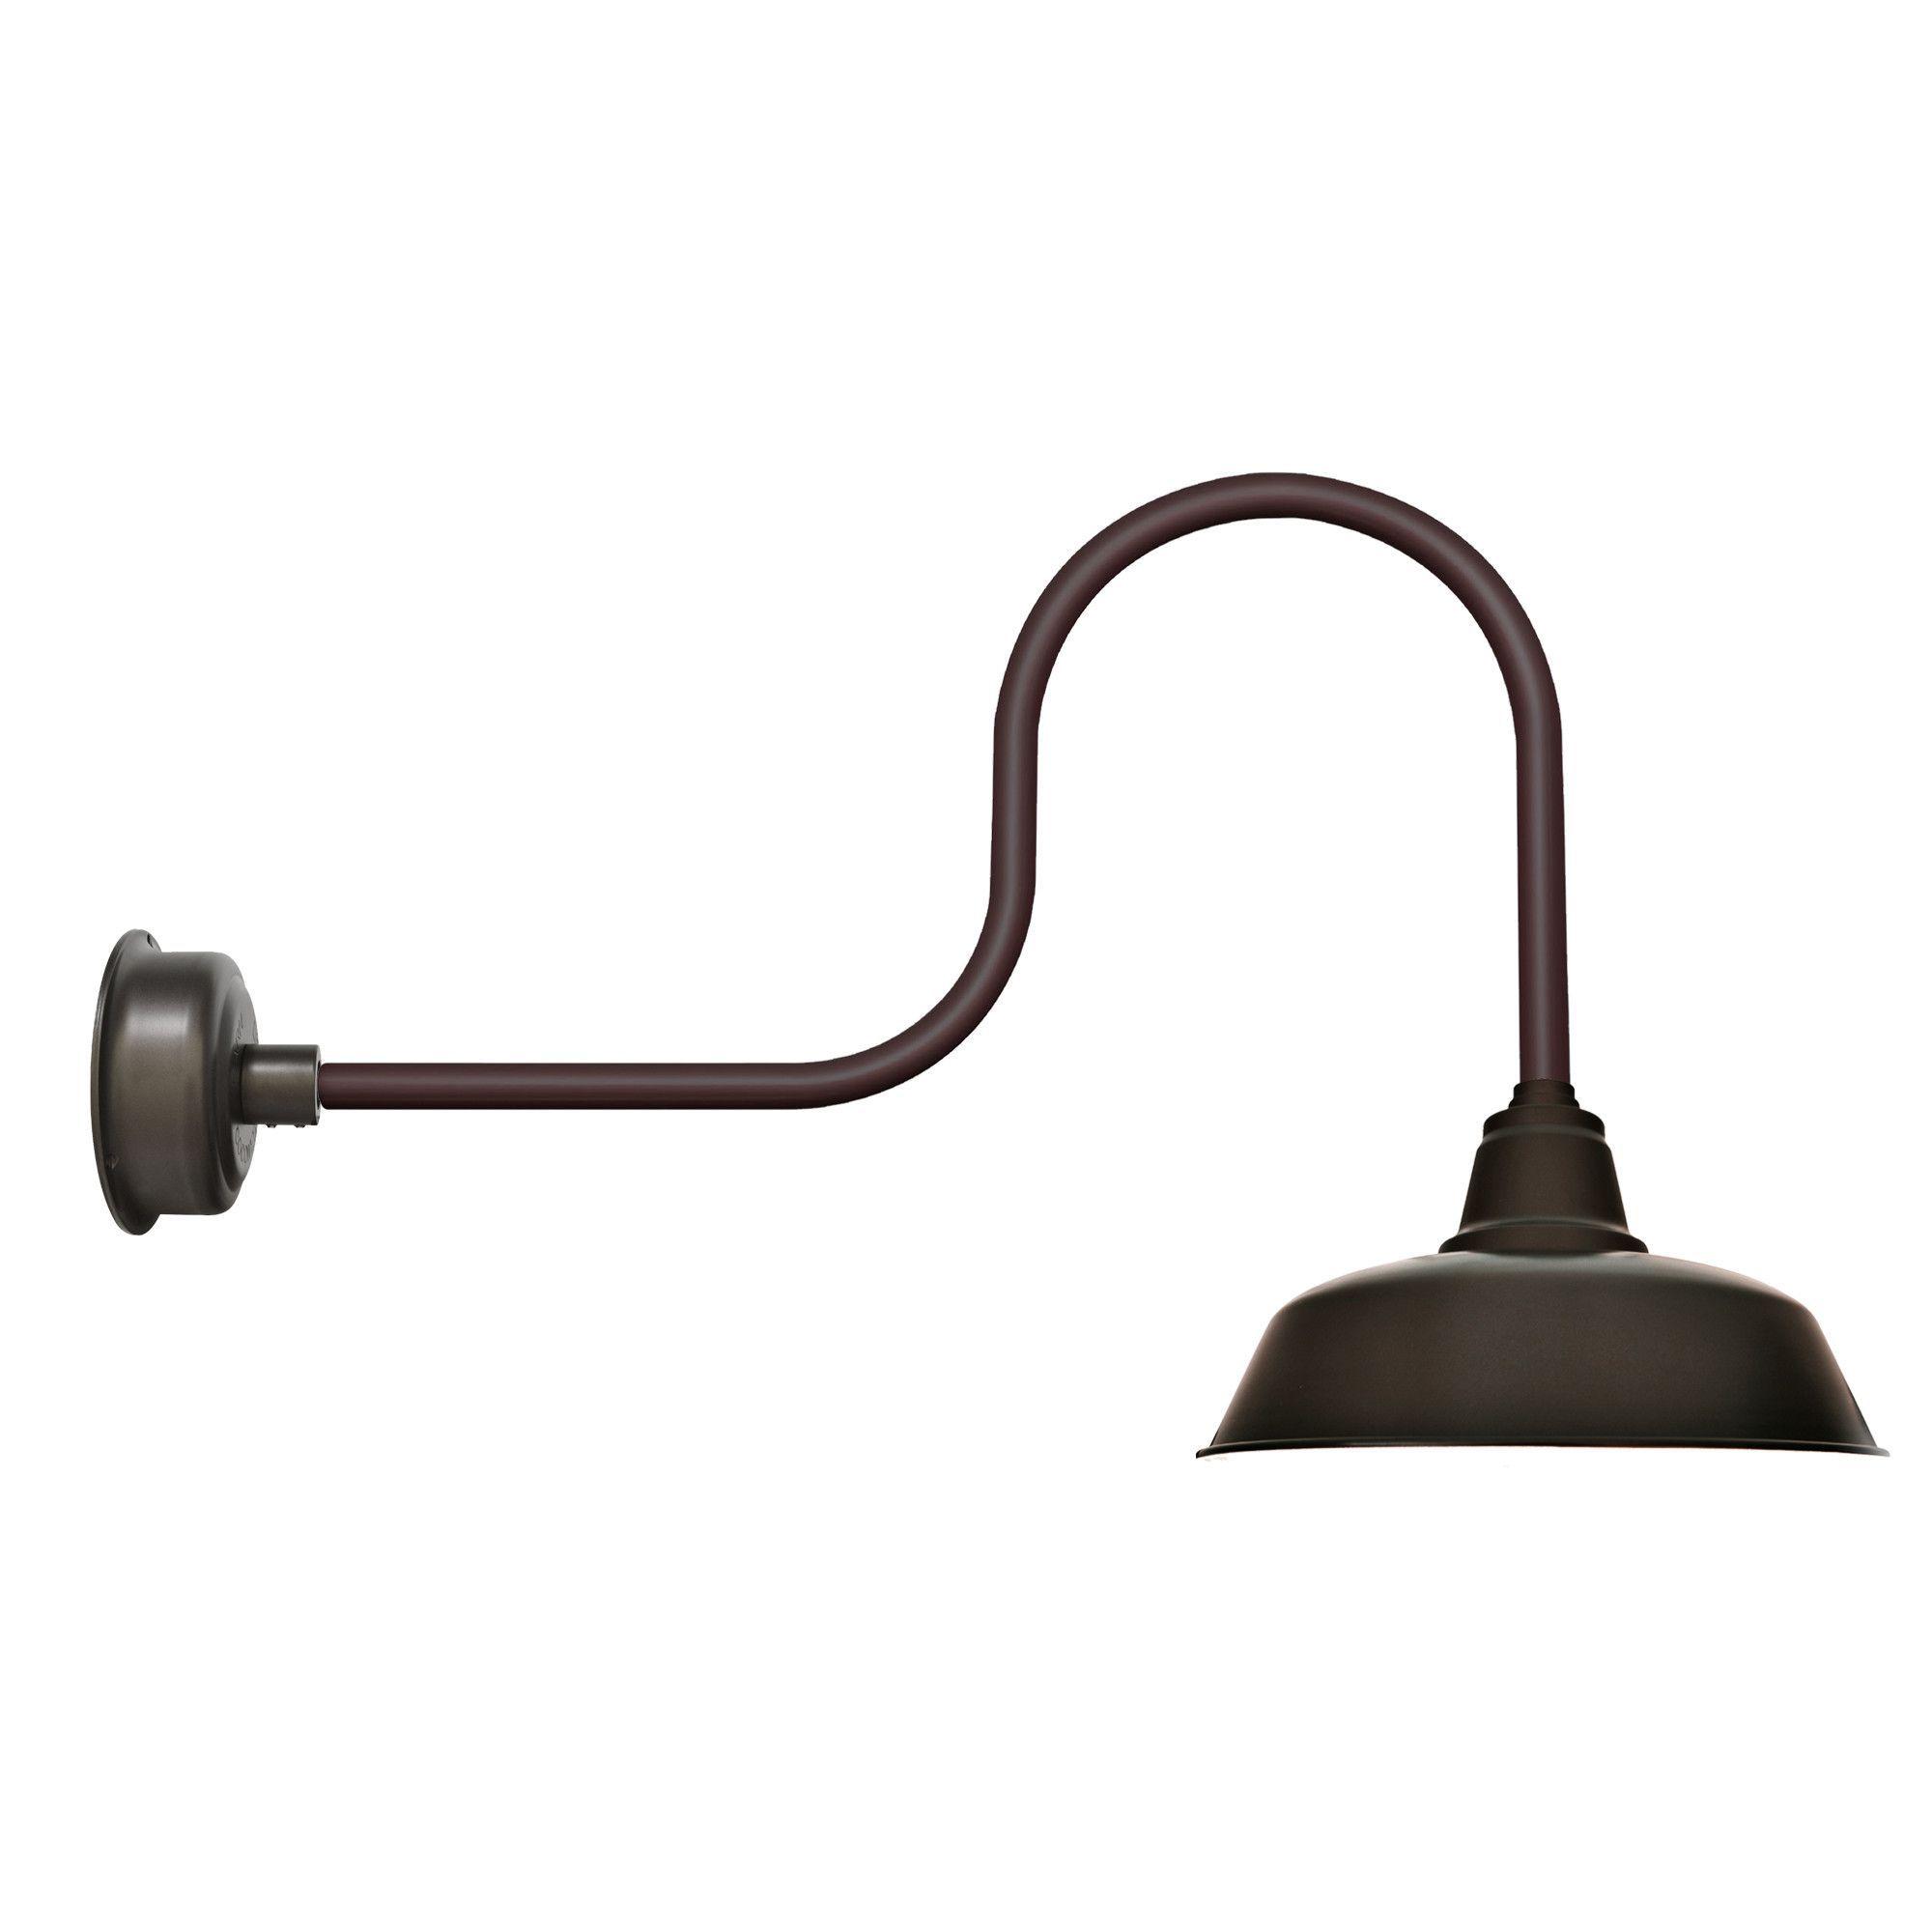 Goodyear light outdoor barn light products